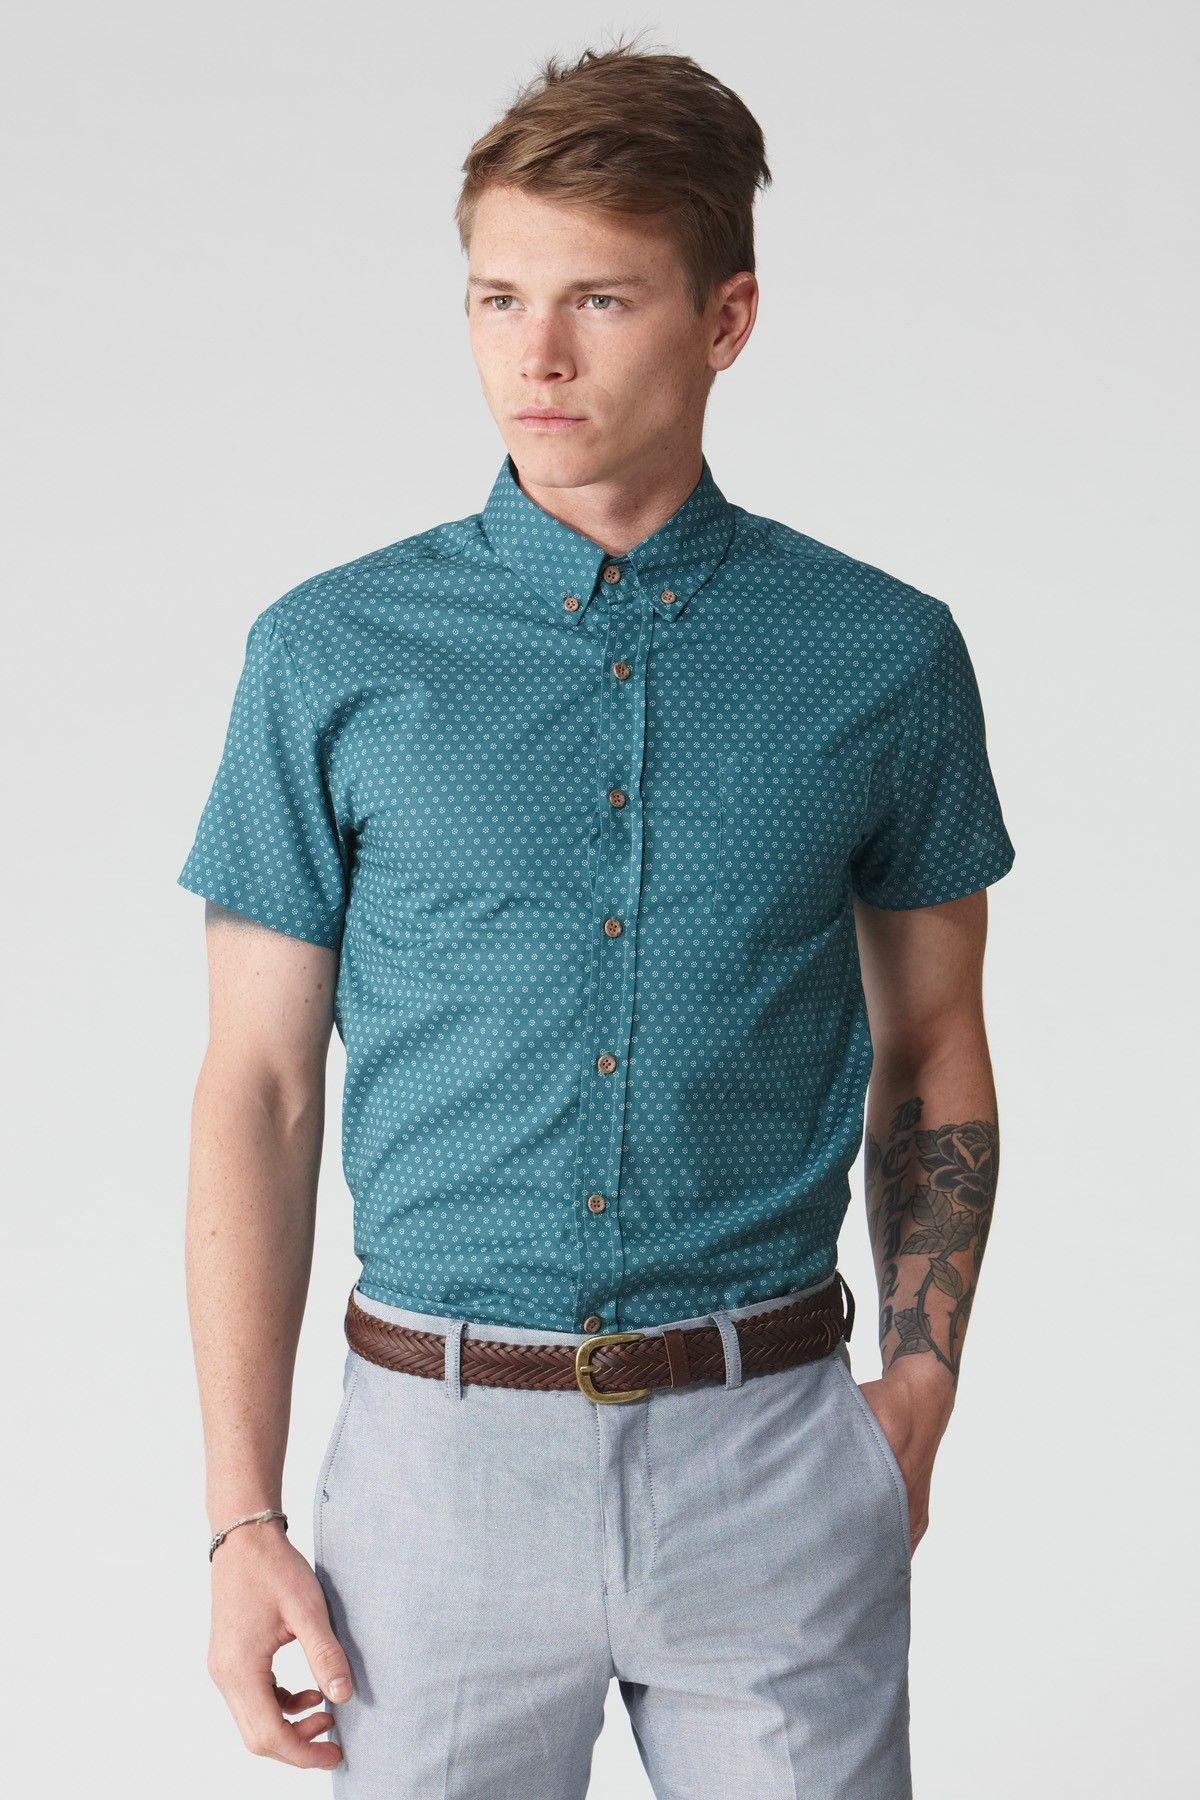 Business casual men, Casual shirts